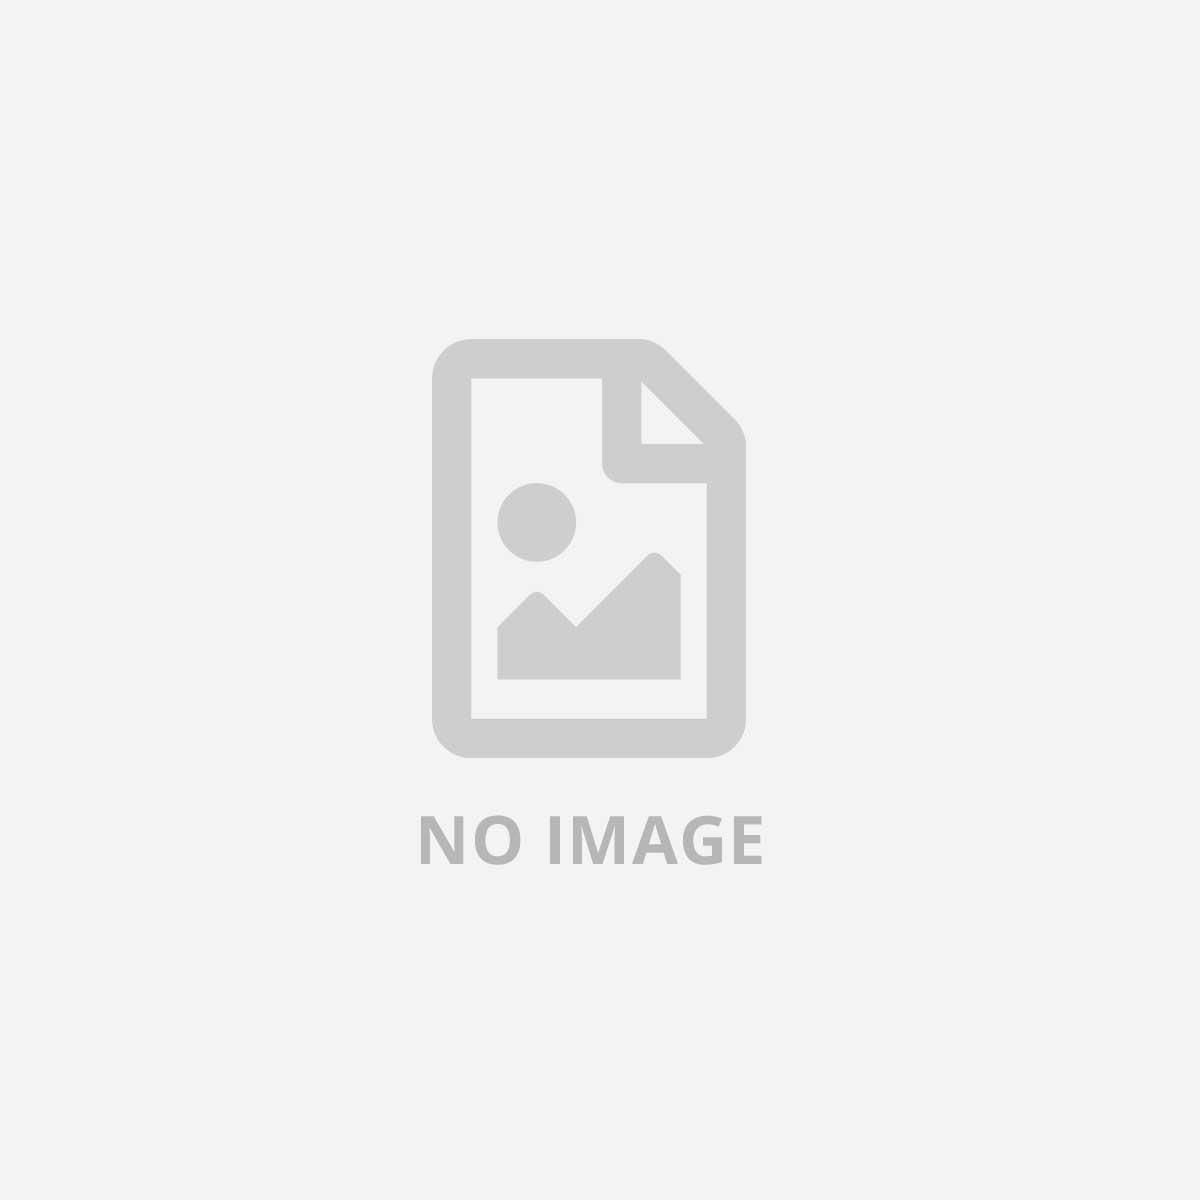 VERBATIM DVD-R 4.7GB 16X COLOR SLIM 5.PZ   S